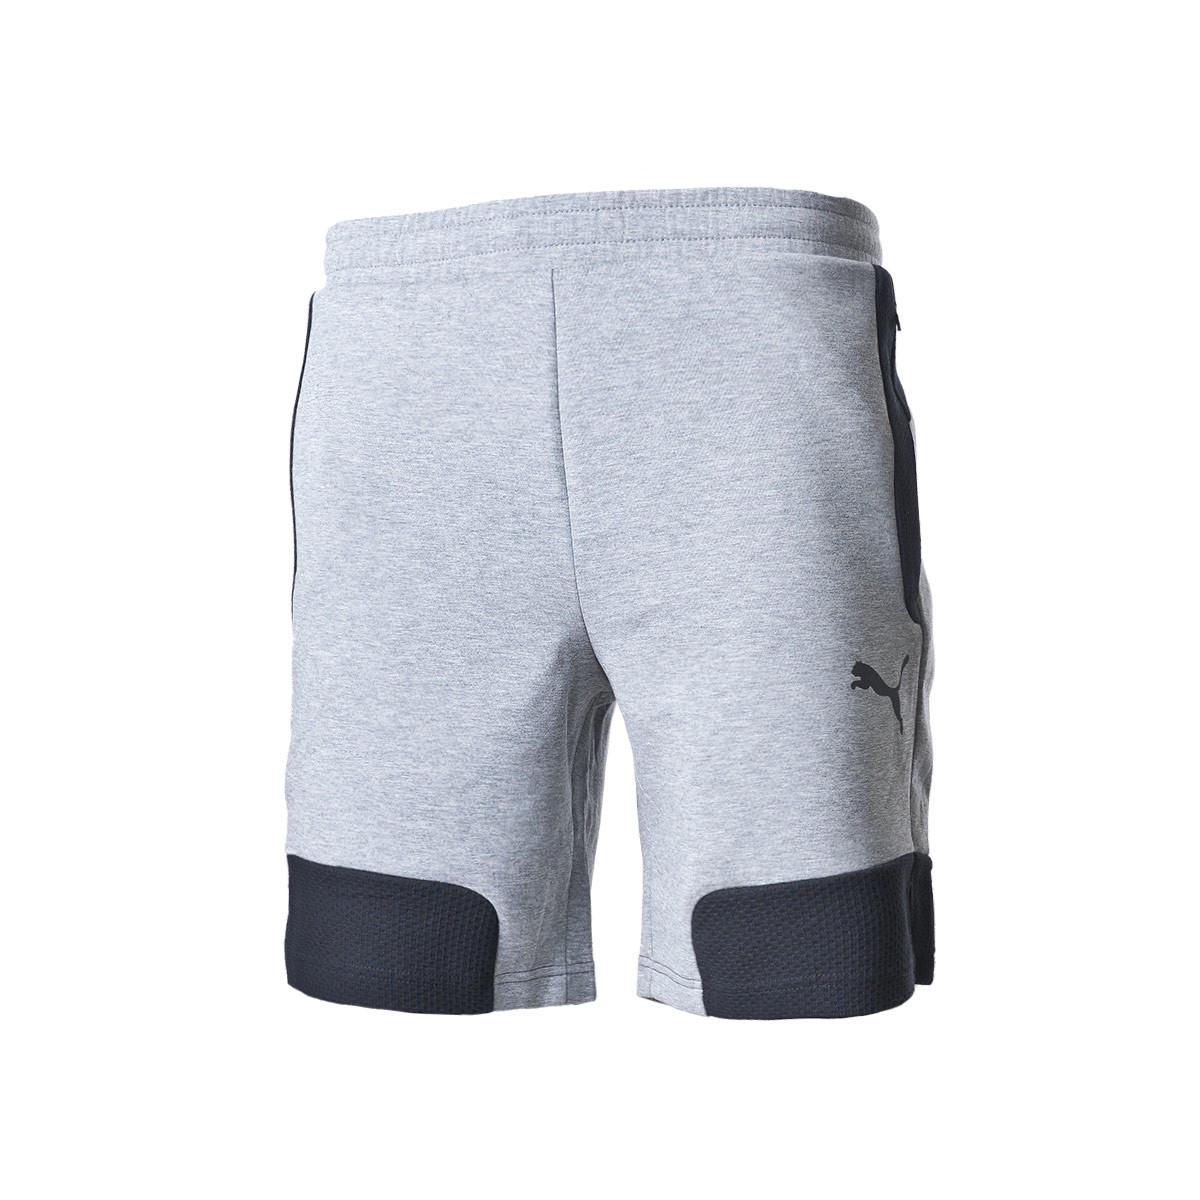 Shorts Puma EVOSTRIPE Shorts 8 Medium Gray Heather - Fútbol Emotion